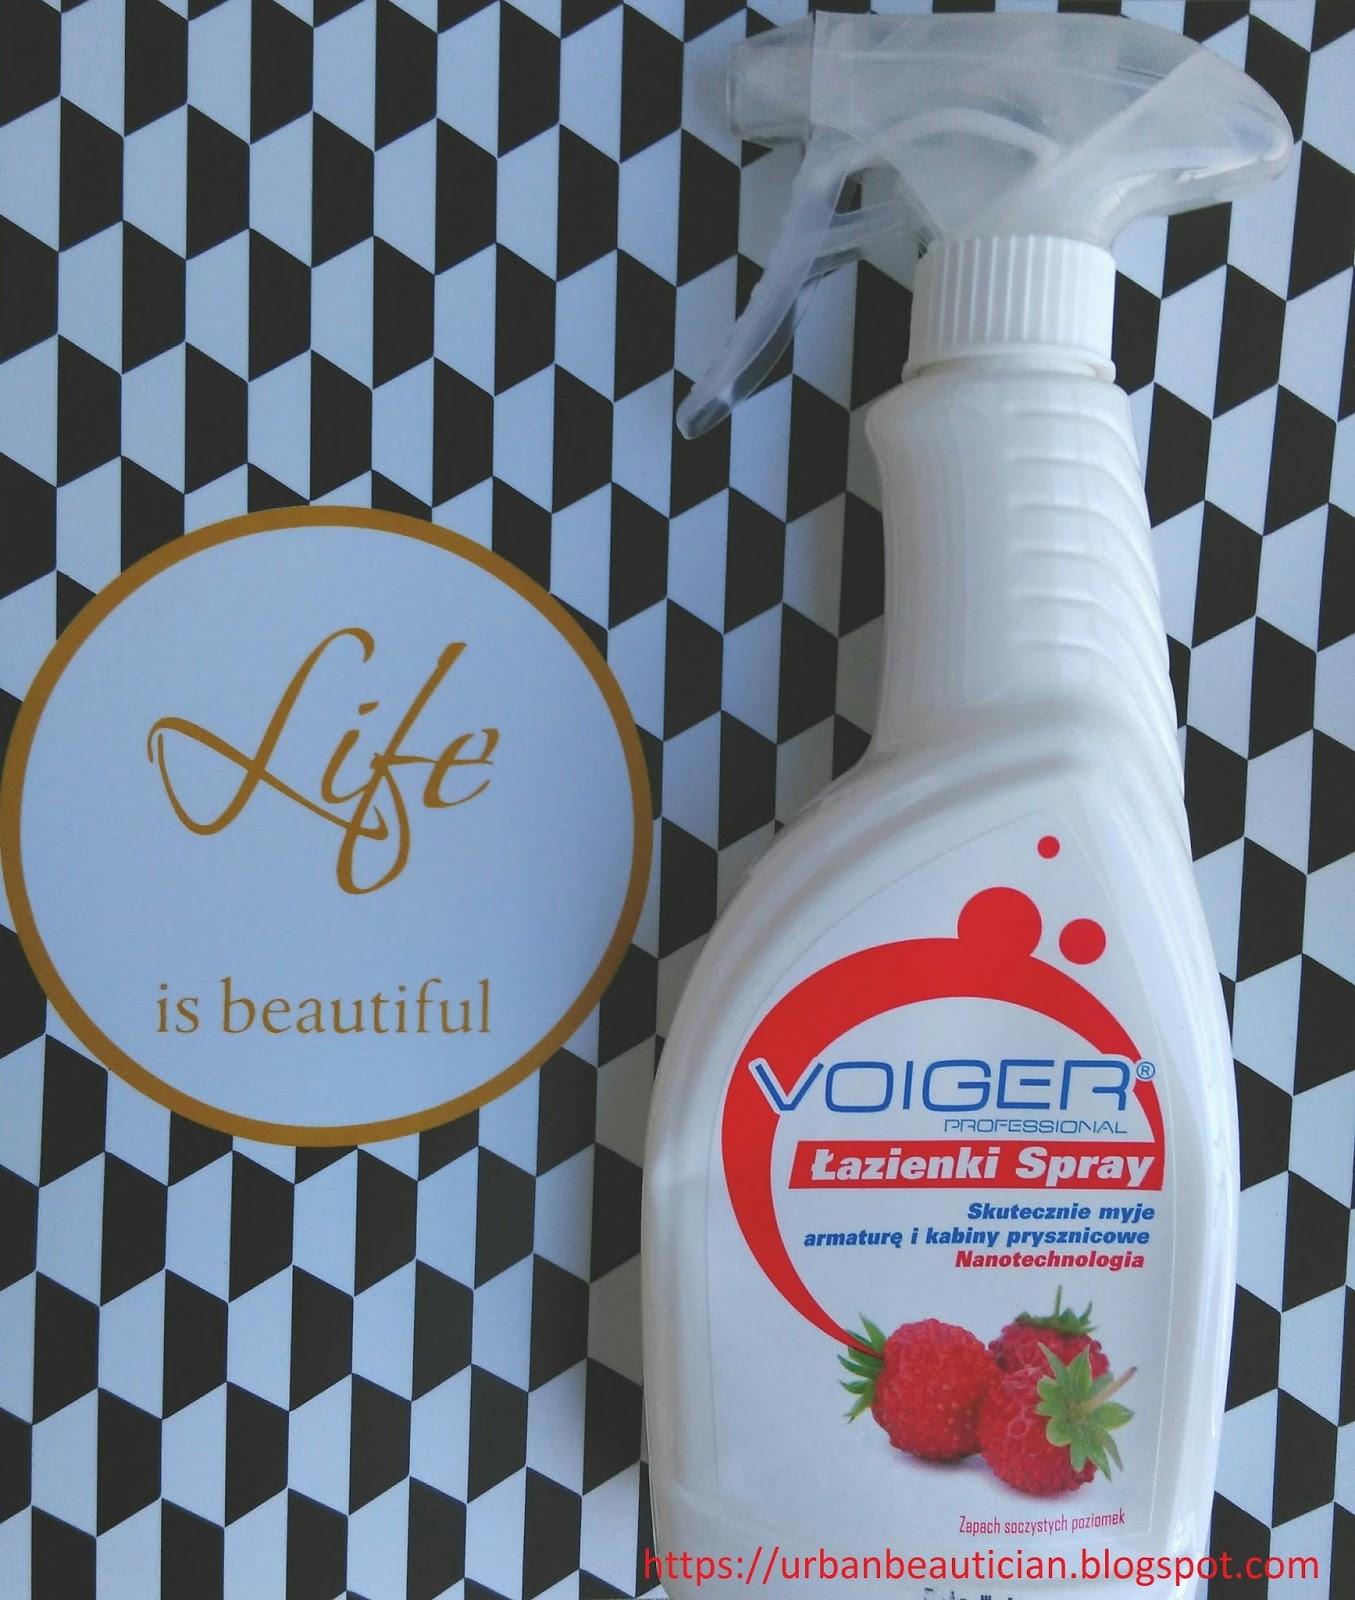 Recenzja Voiger łazienki Spray Voigt Uroda Zblogowani